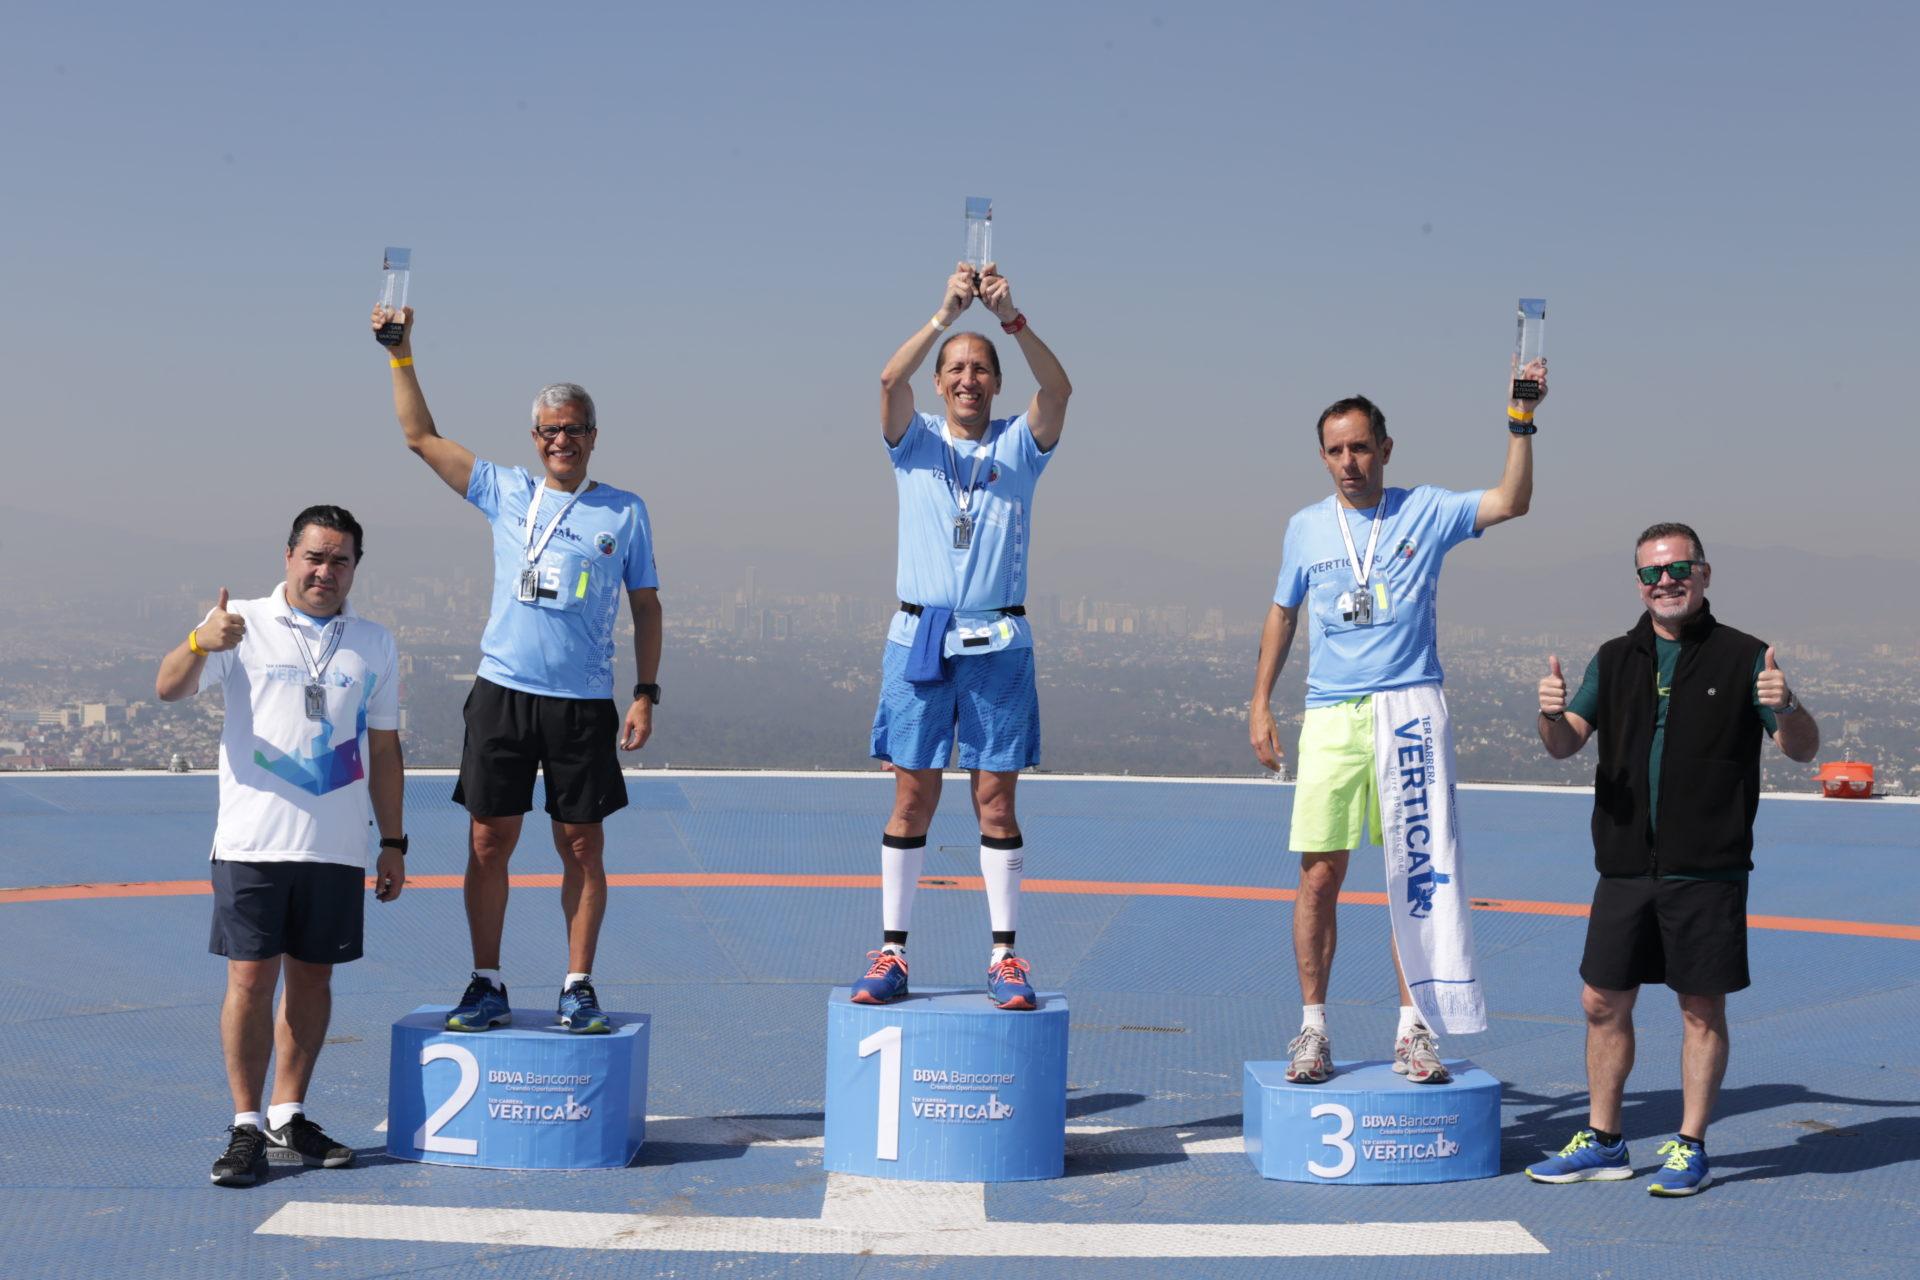 Ganadores Carrera vertical